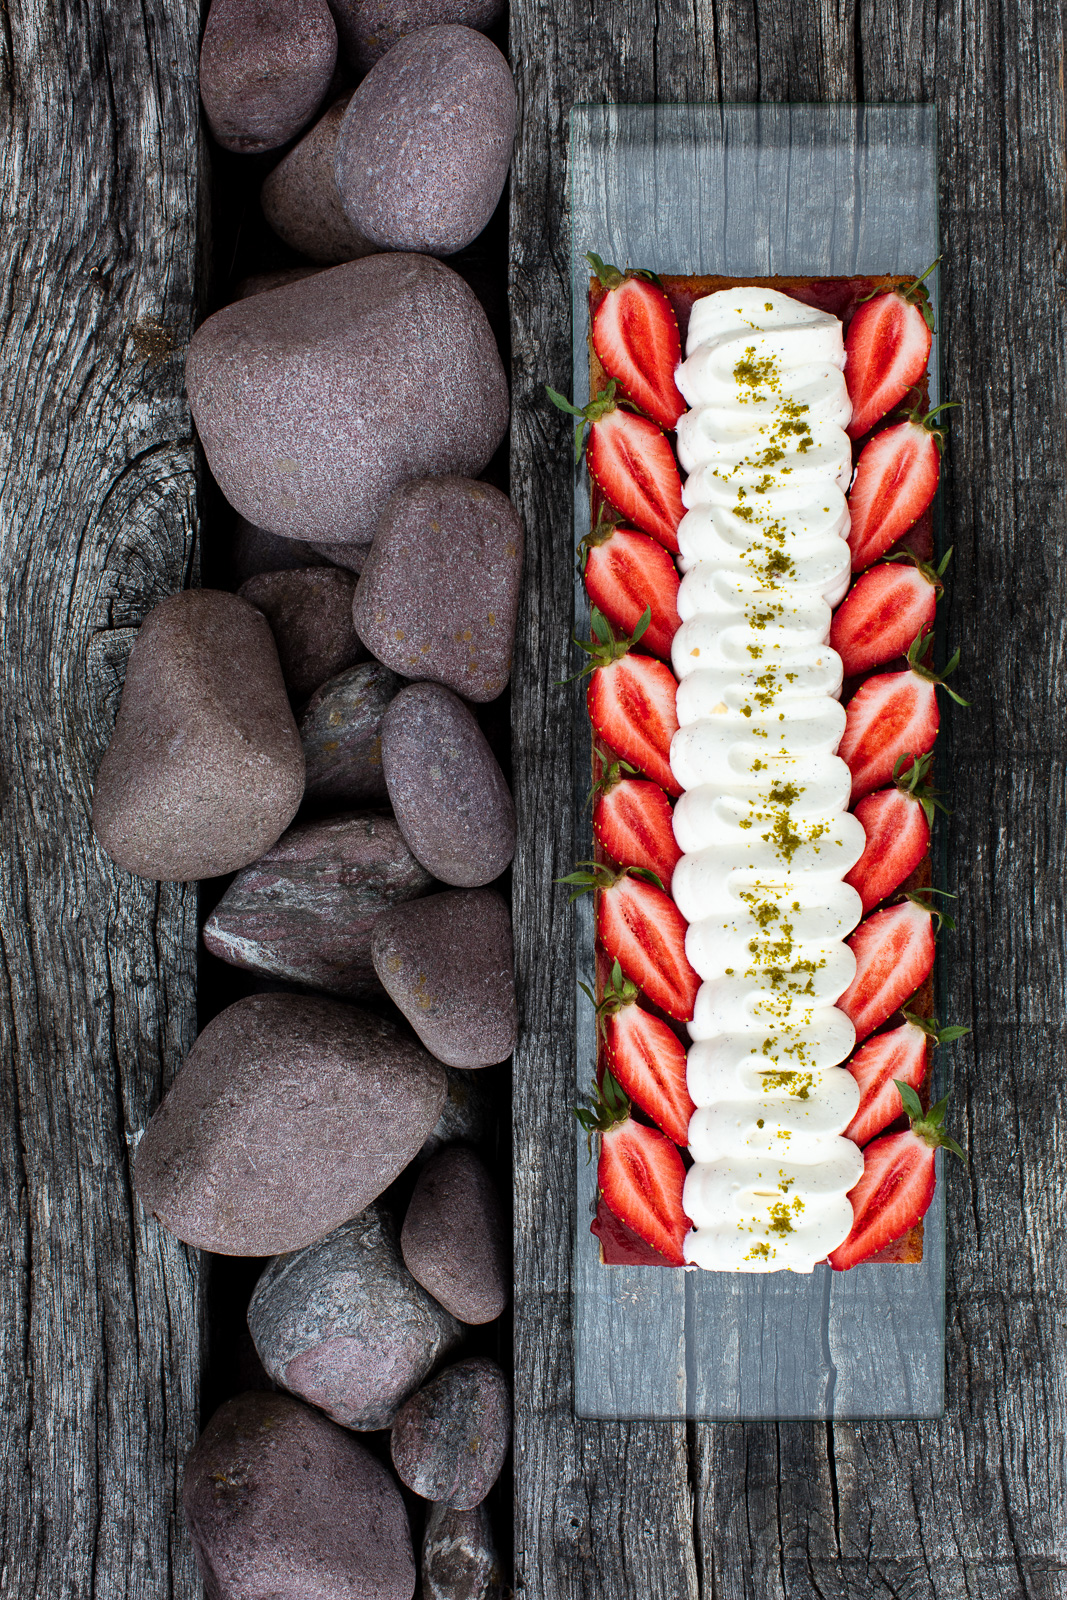 Franck_Hamel_Sofitel_Quiberon_valerie_paumelle_agent-photographe_culinaire-foodphotographer (5).jpg